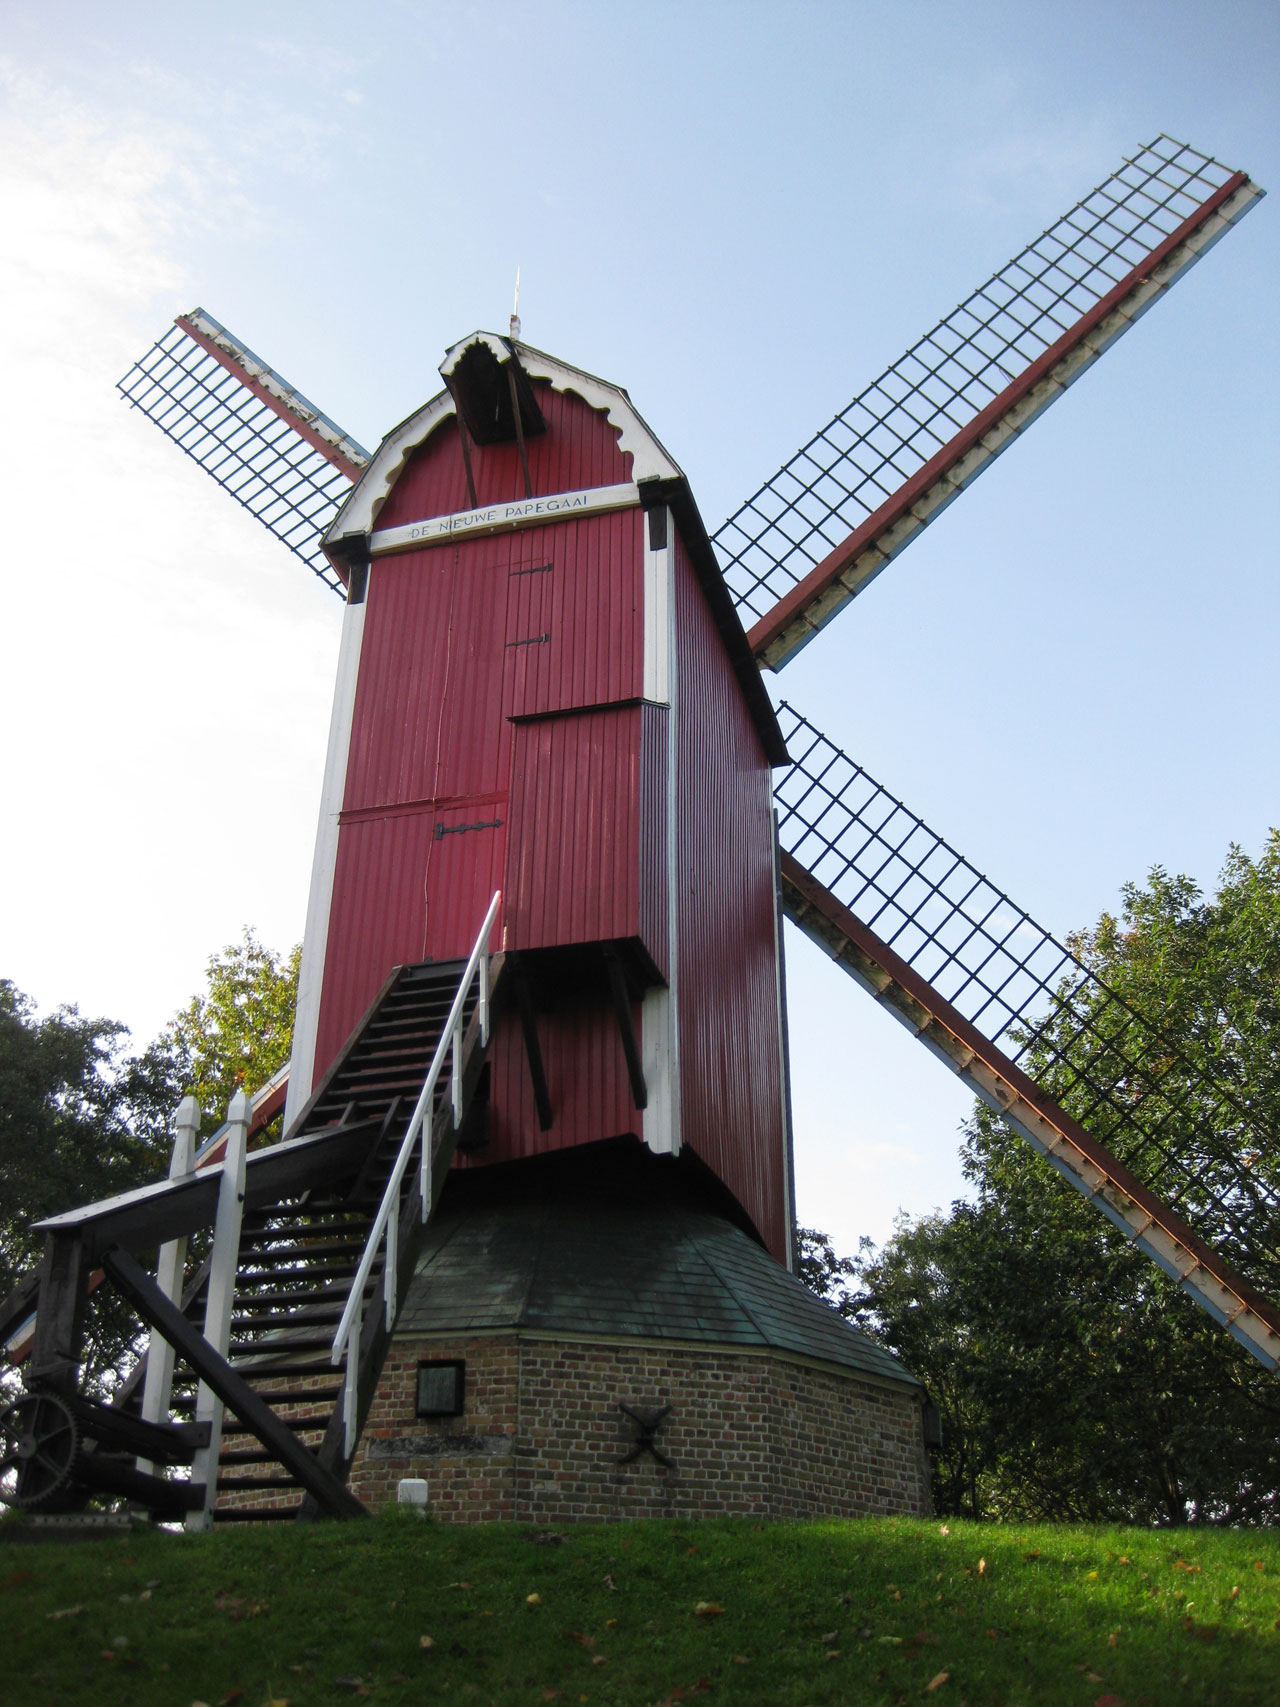 De Nieuwe Papegaai windmill, Bruges, Belgium